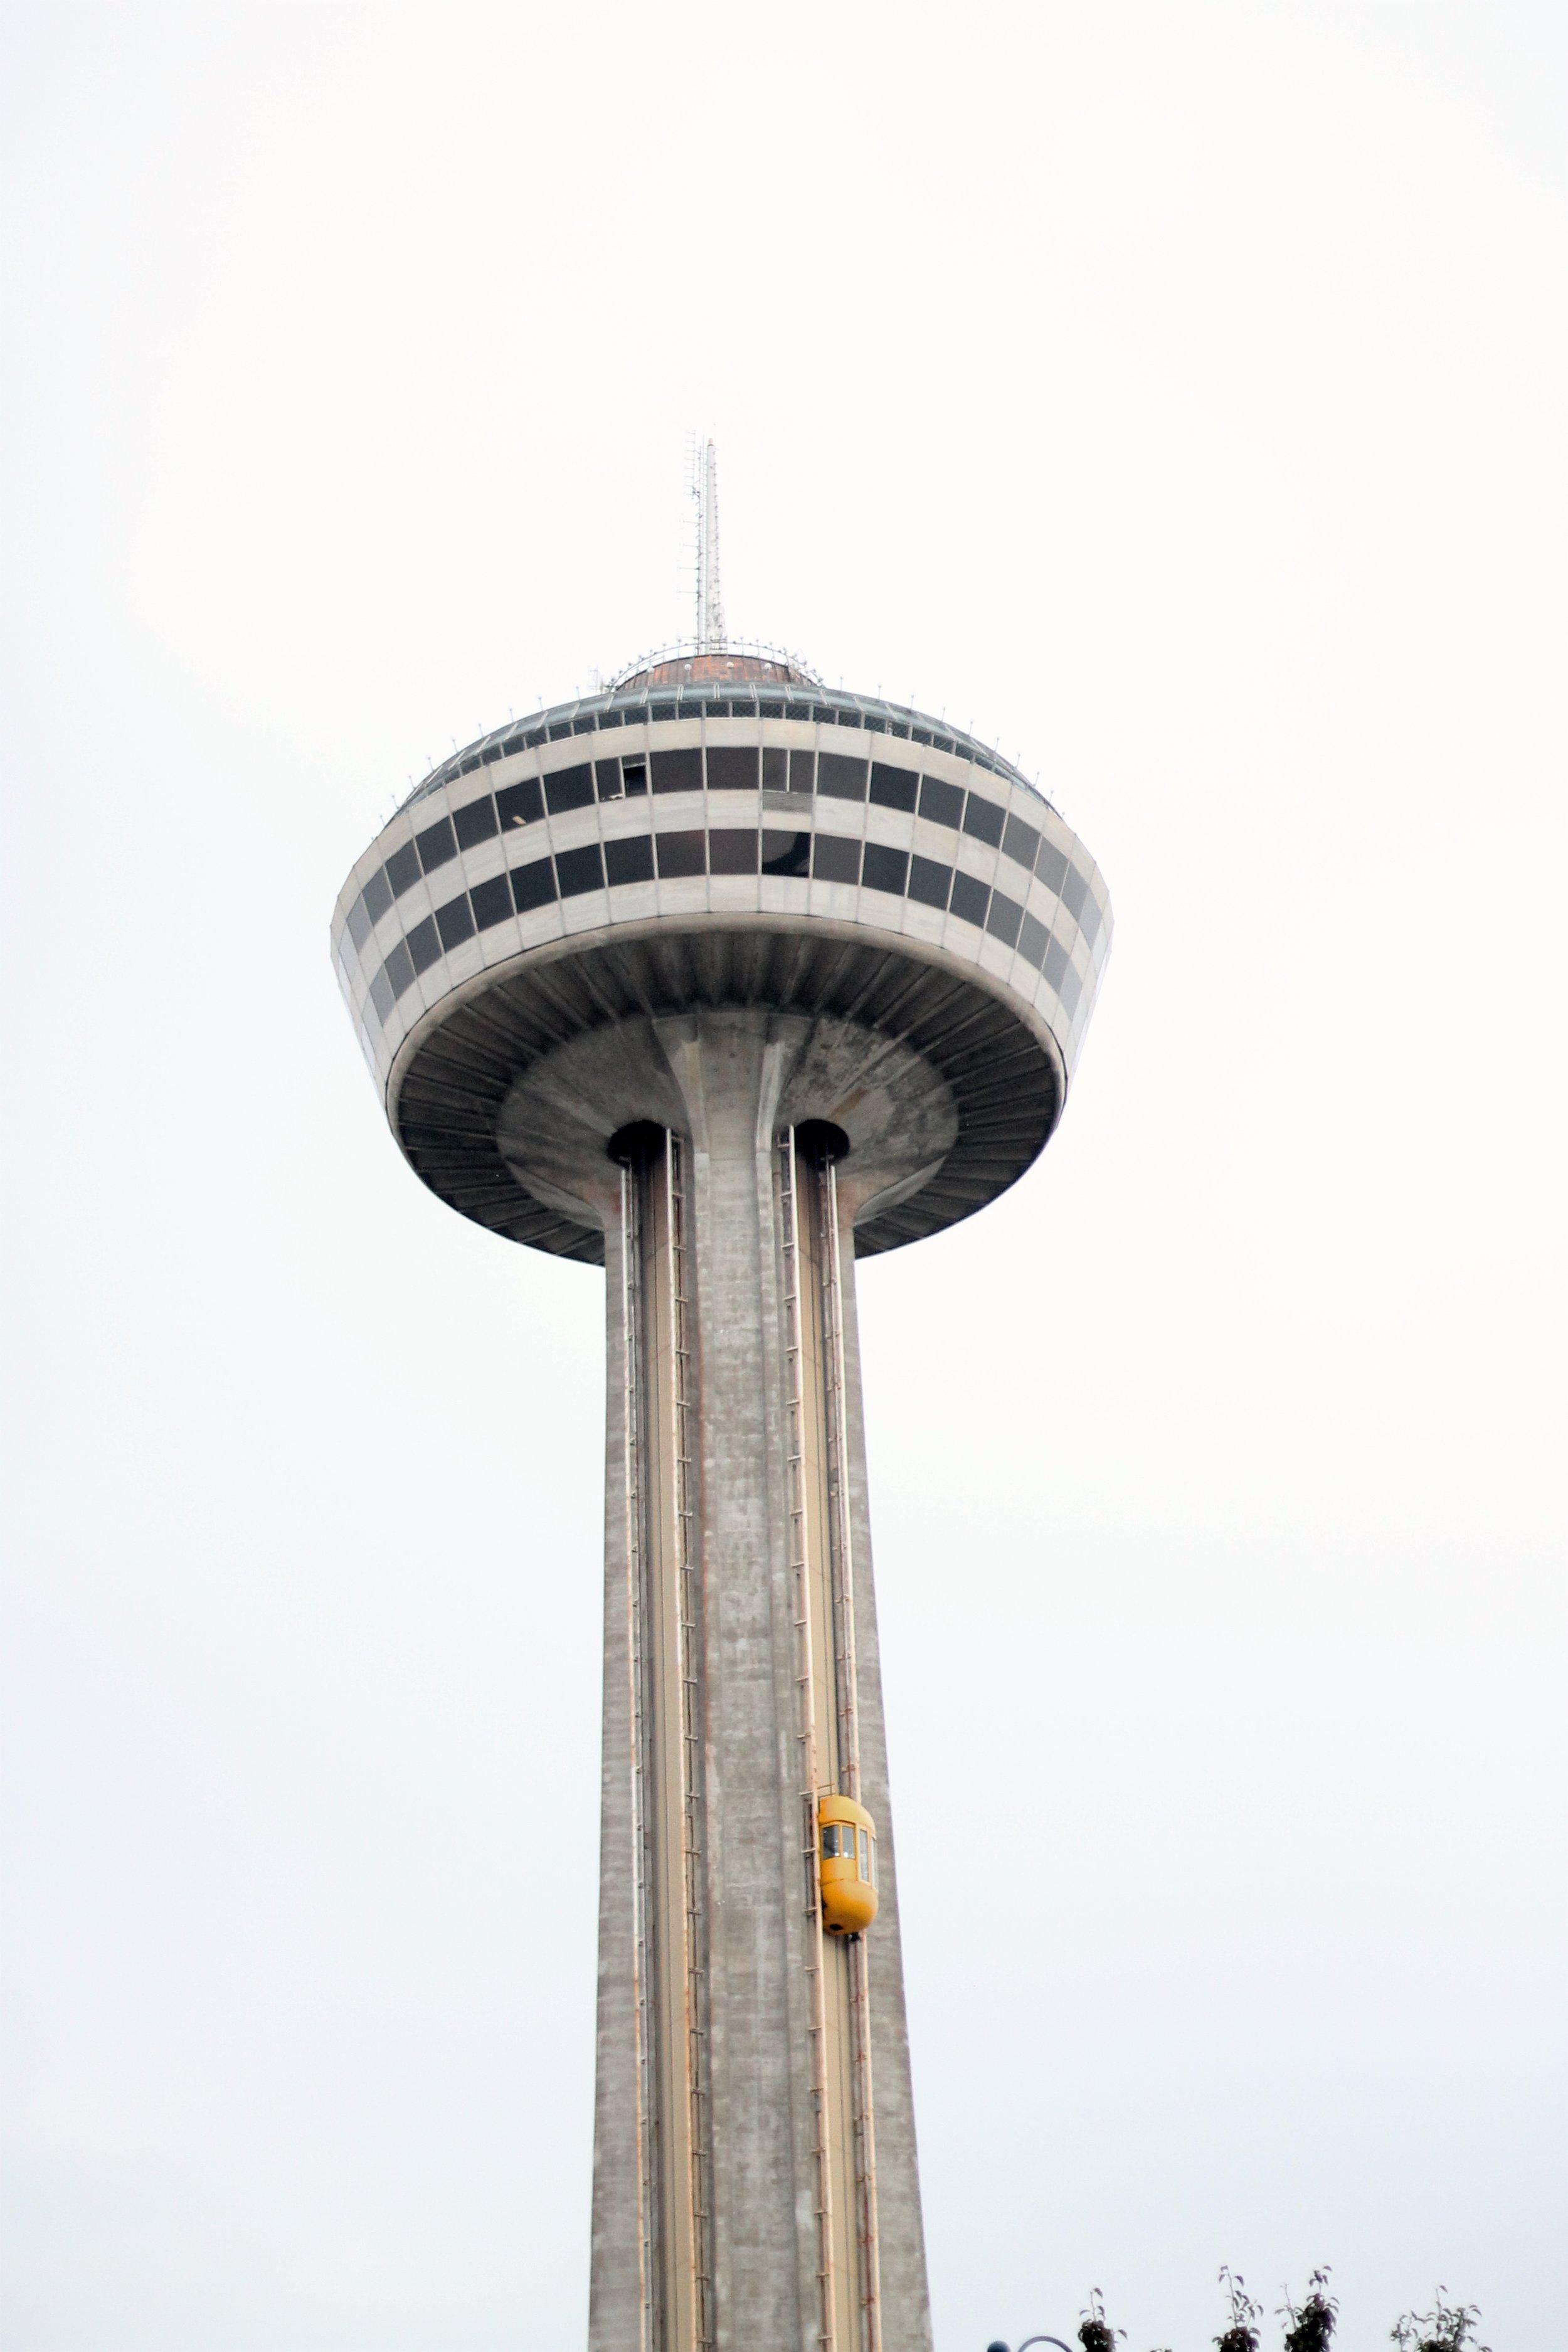 The Skylon Tower in Niagara Falls, ON Canada taken by Bratty B